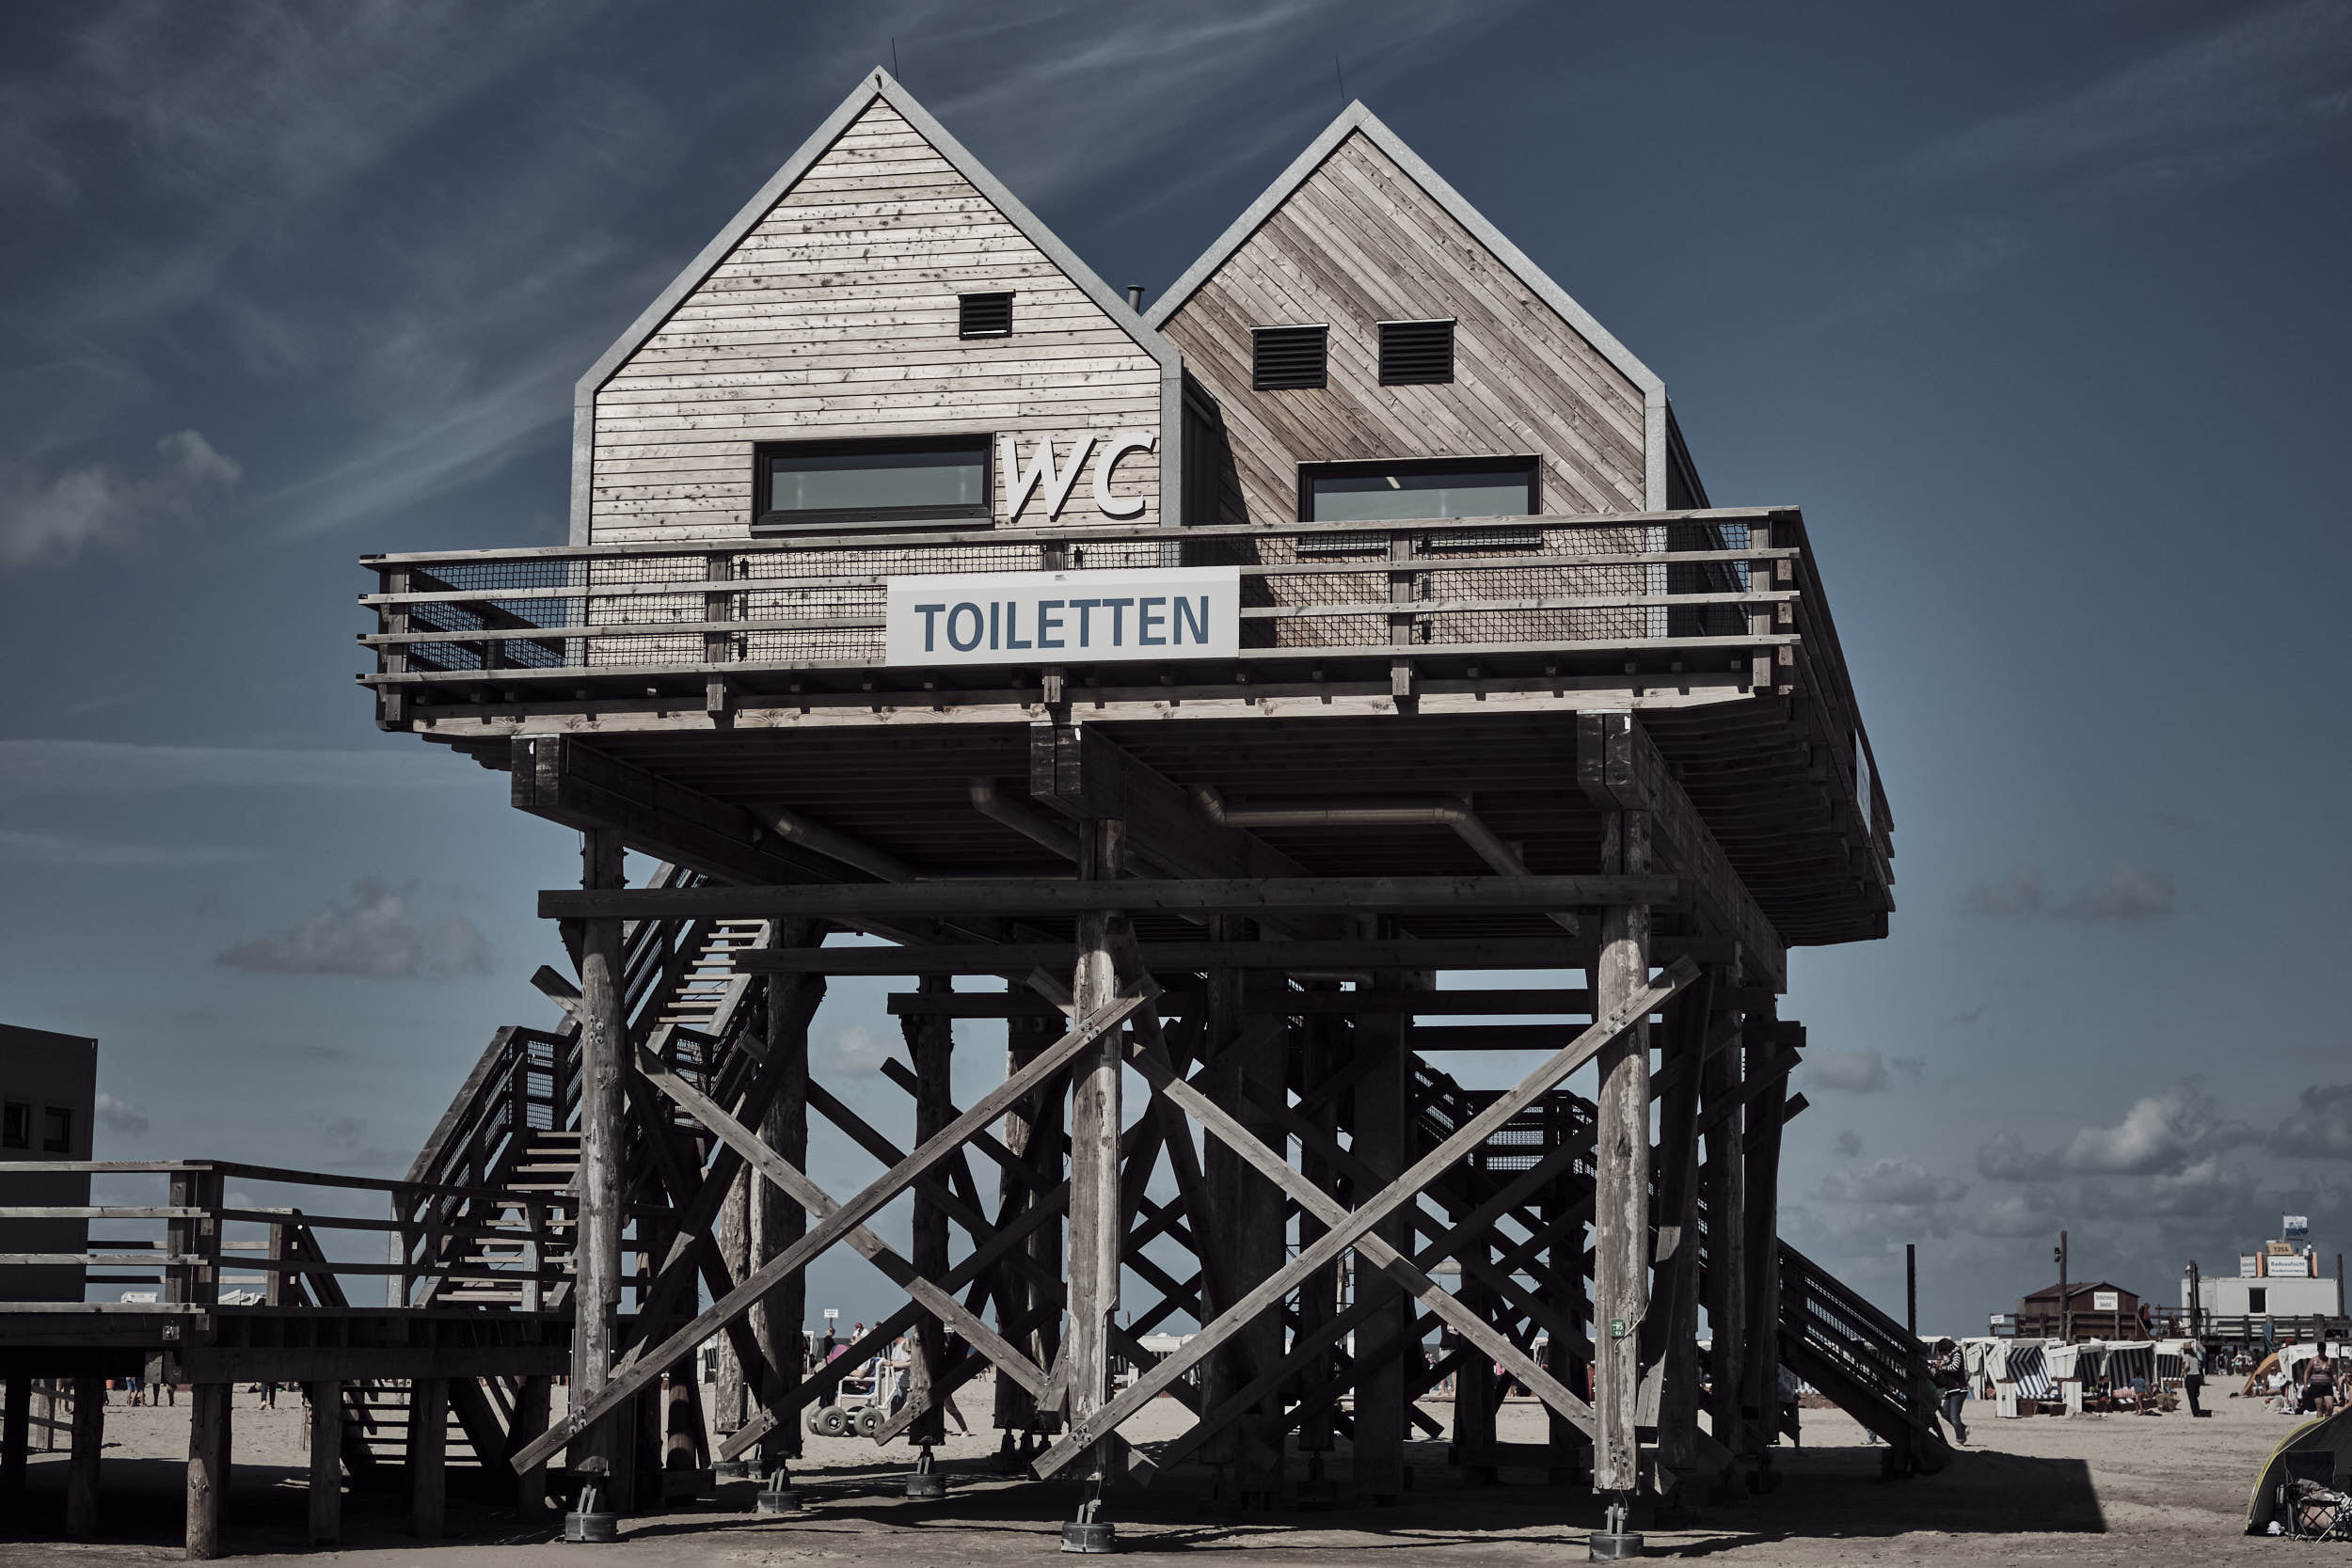 neue Toilettenhausgeneration Sankt-Peter-ording, Strand